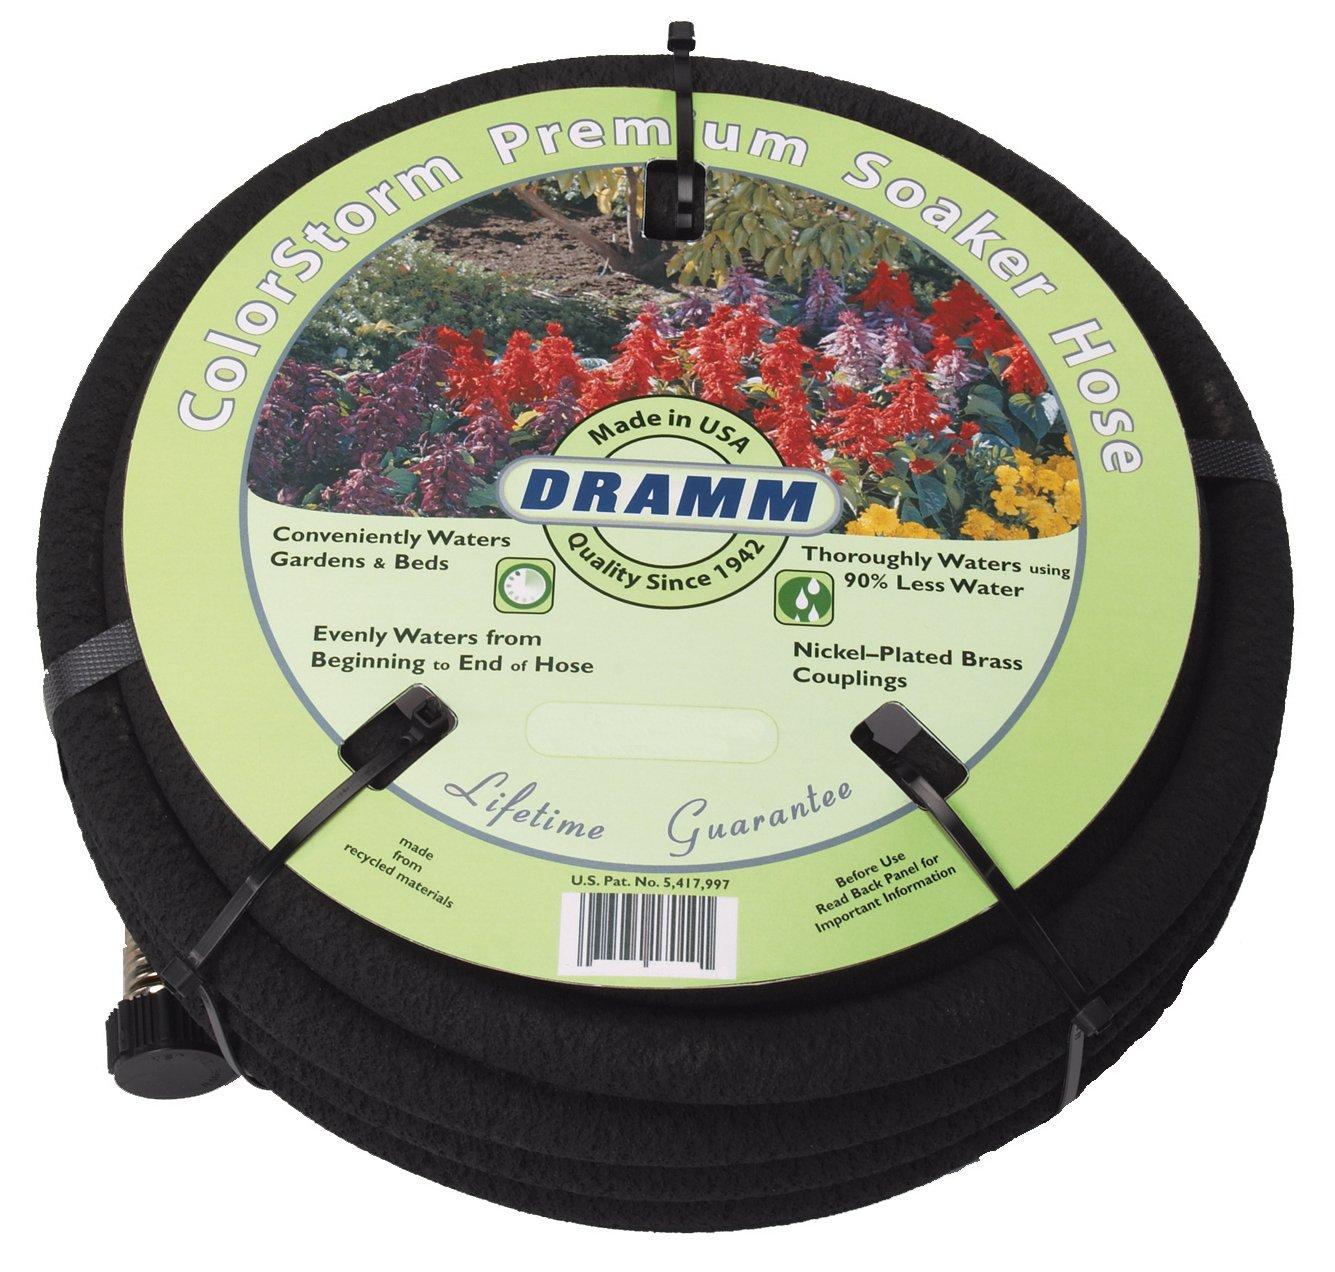 Amazon.com : Dramm 17010 ColorStorm Premium 50 Foot Soaker Garden Hose,  Black : Watering Nozzles : Garden U0026 Outdoor